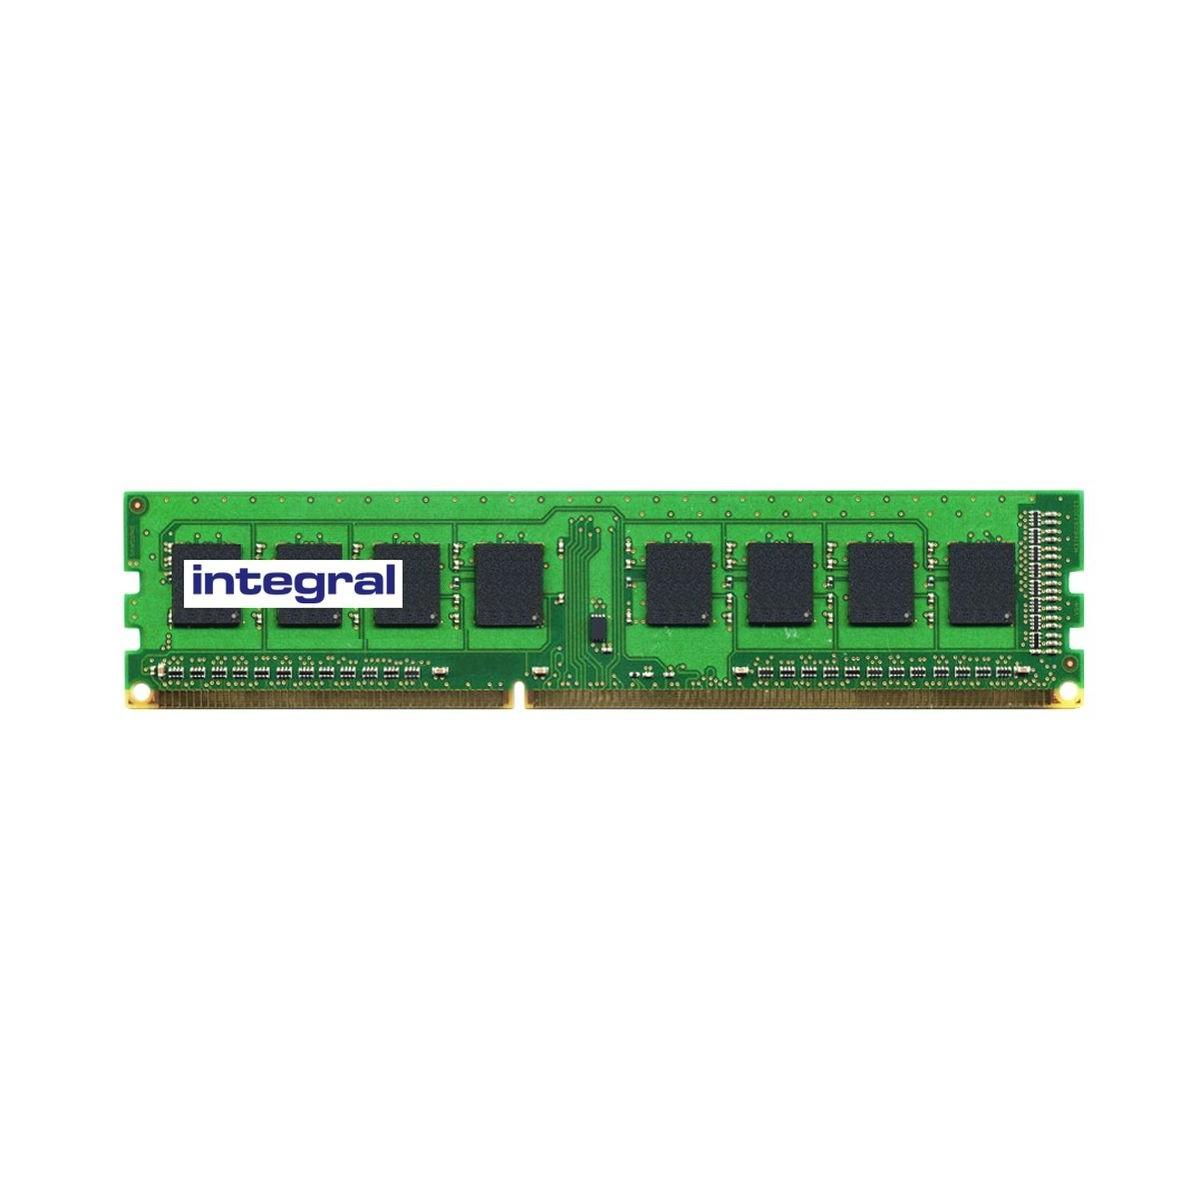 HP DL180 G9 SIX E5 2603 v3 8GB NOWE 2x1TB B140i